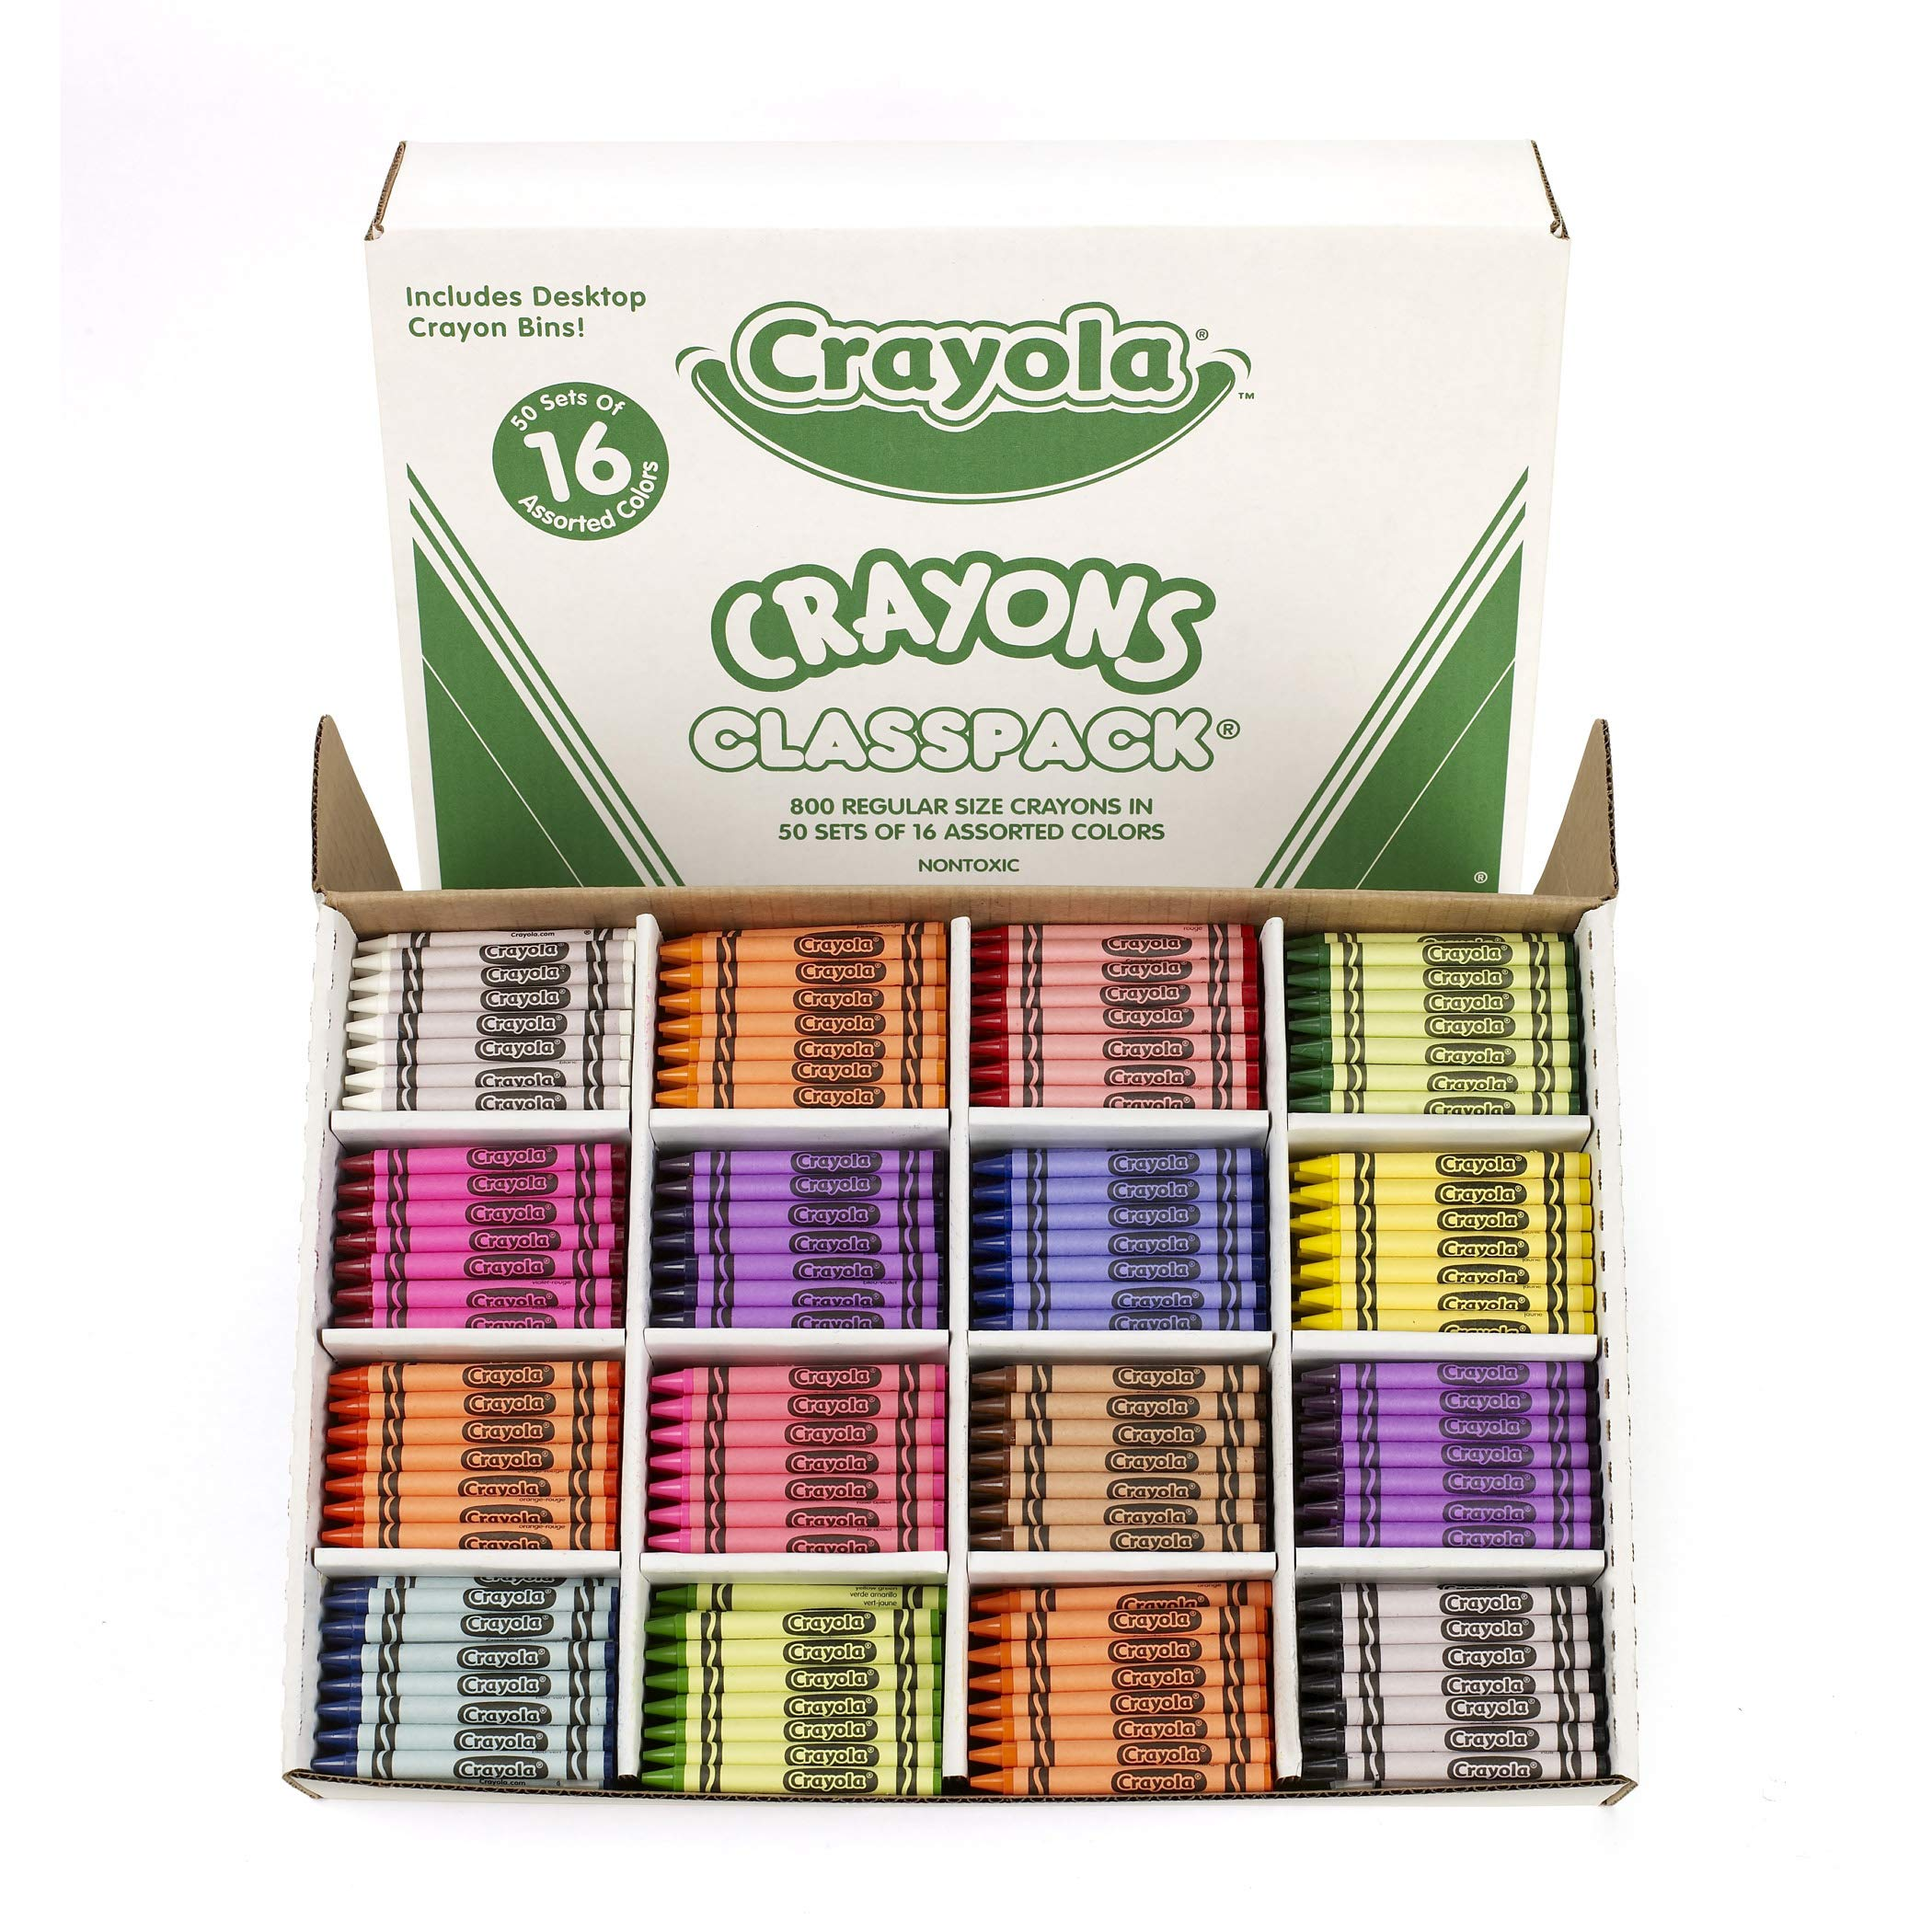 Crayola Classpack Assortment, School Supplies, 16 Different Colors (50 Each), 800 Regular Size Crayons by Crayola